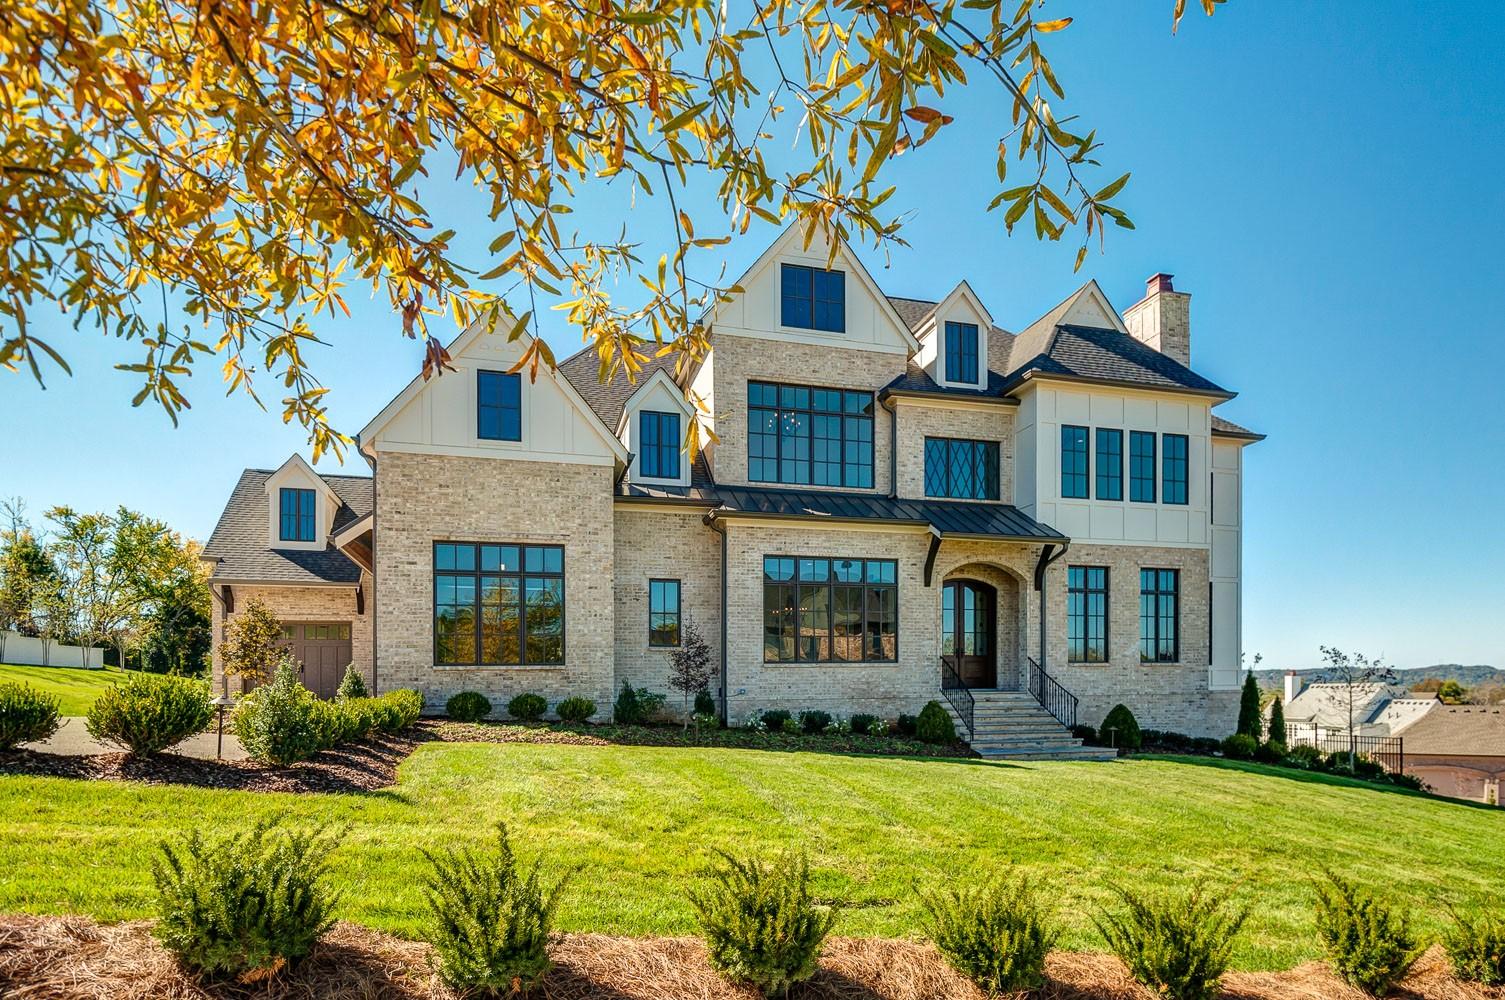 9241 Lehigh Drive (#70), Brentwood, TN 37027 - Brentwood, TN real estate listing